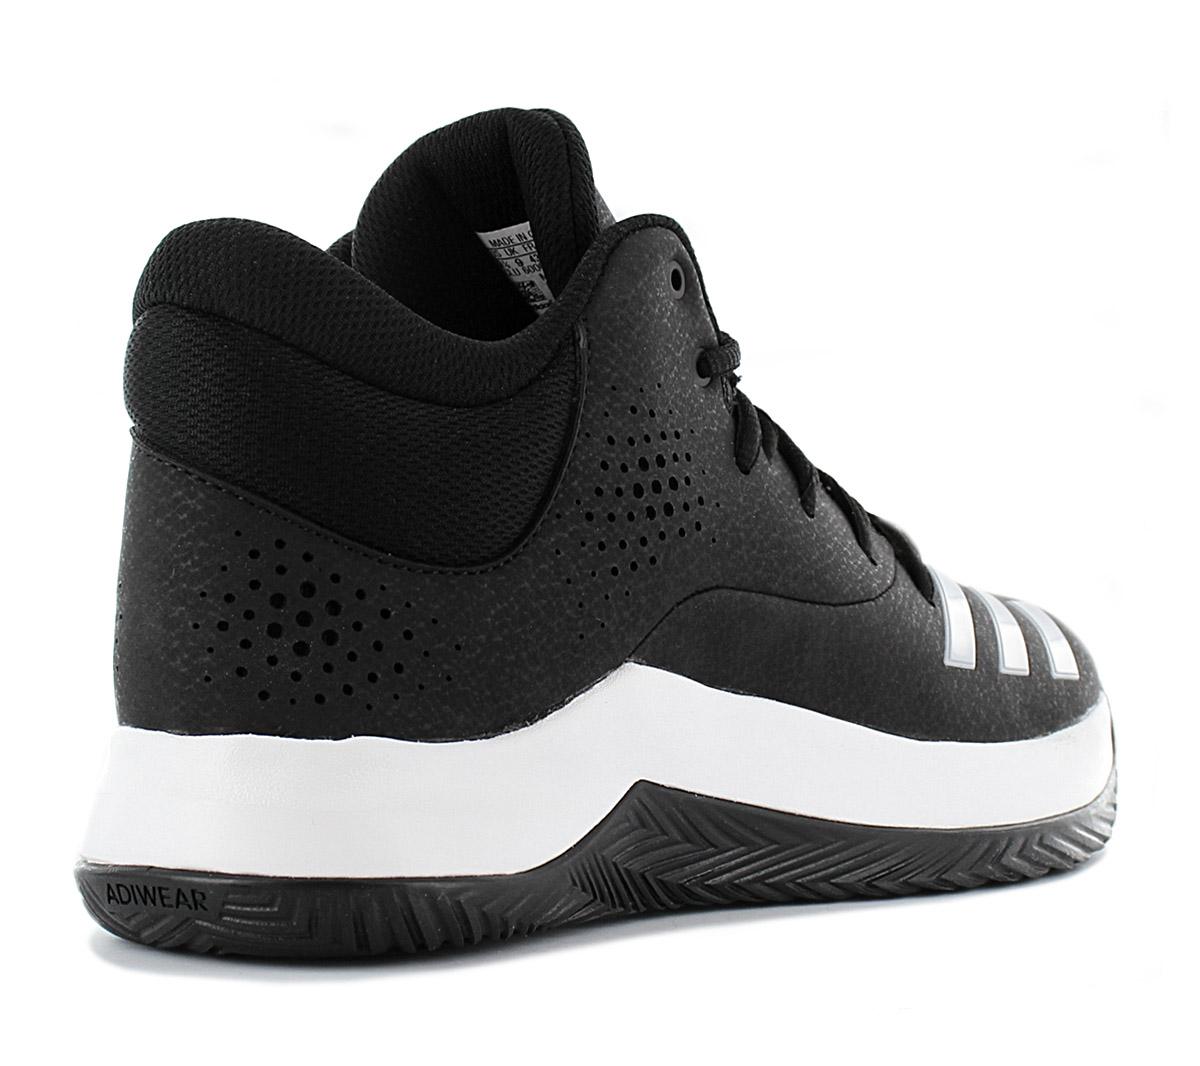 d3c068addf7f Adidas Court Fury 2017 Men s Basketballshoe By4188 Black Shoes ...